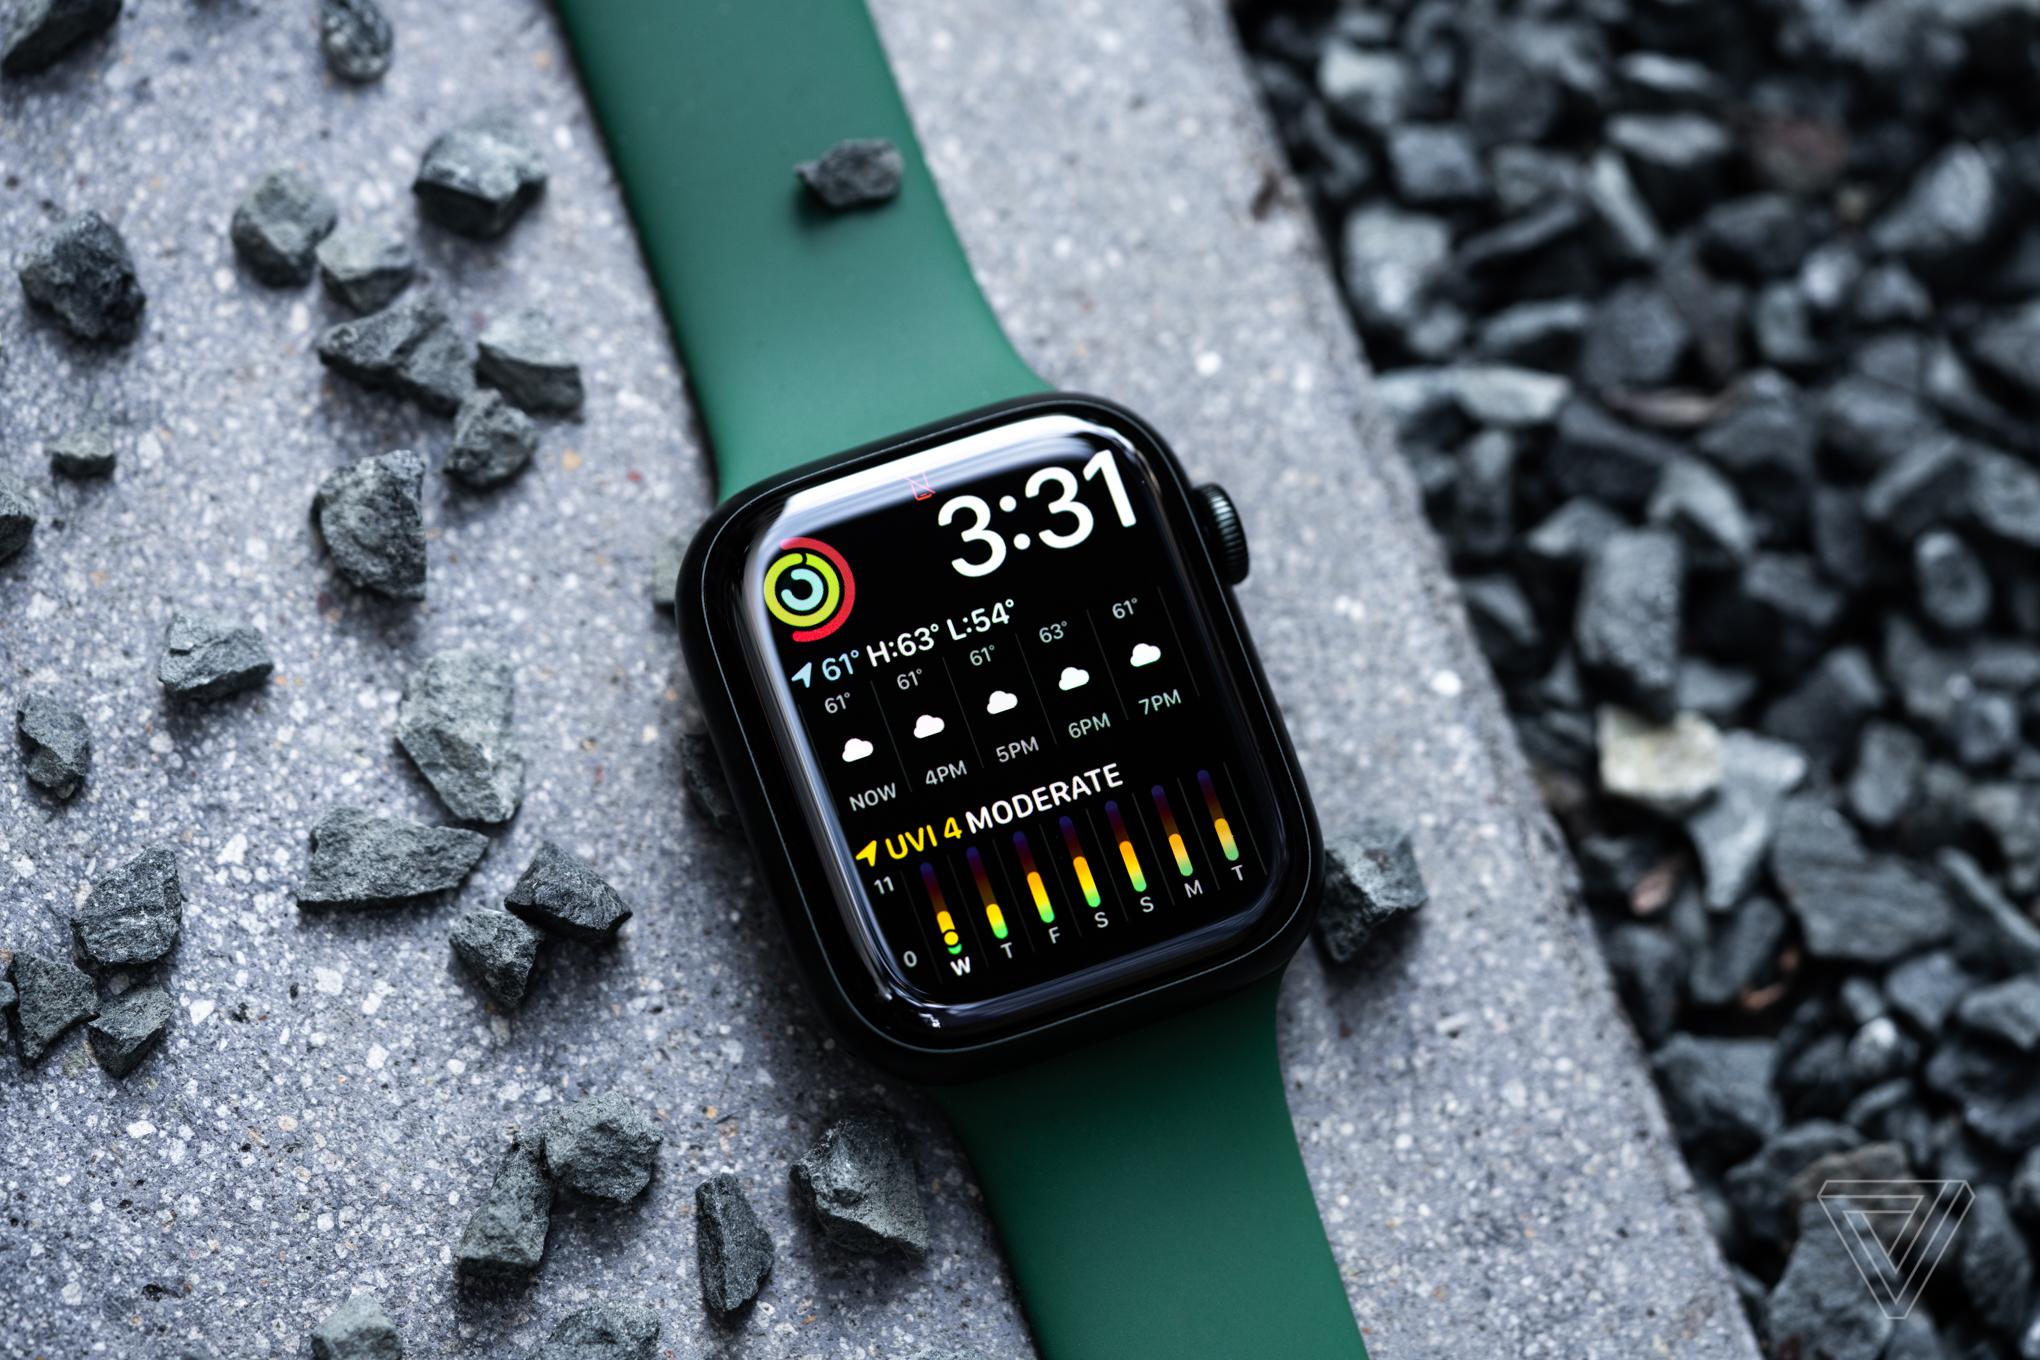 The Apple Watch Series 7